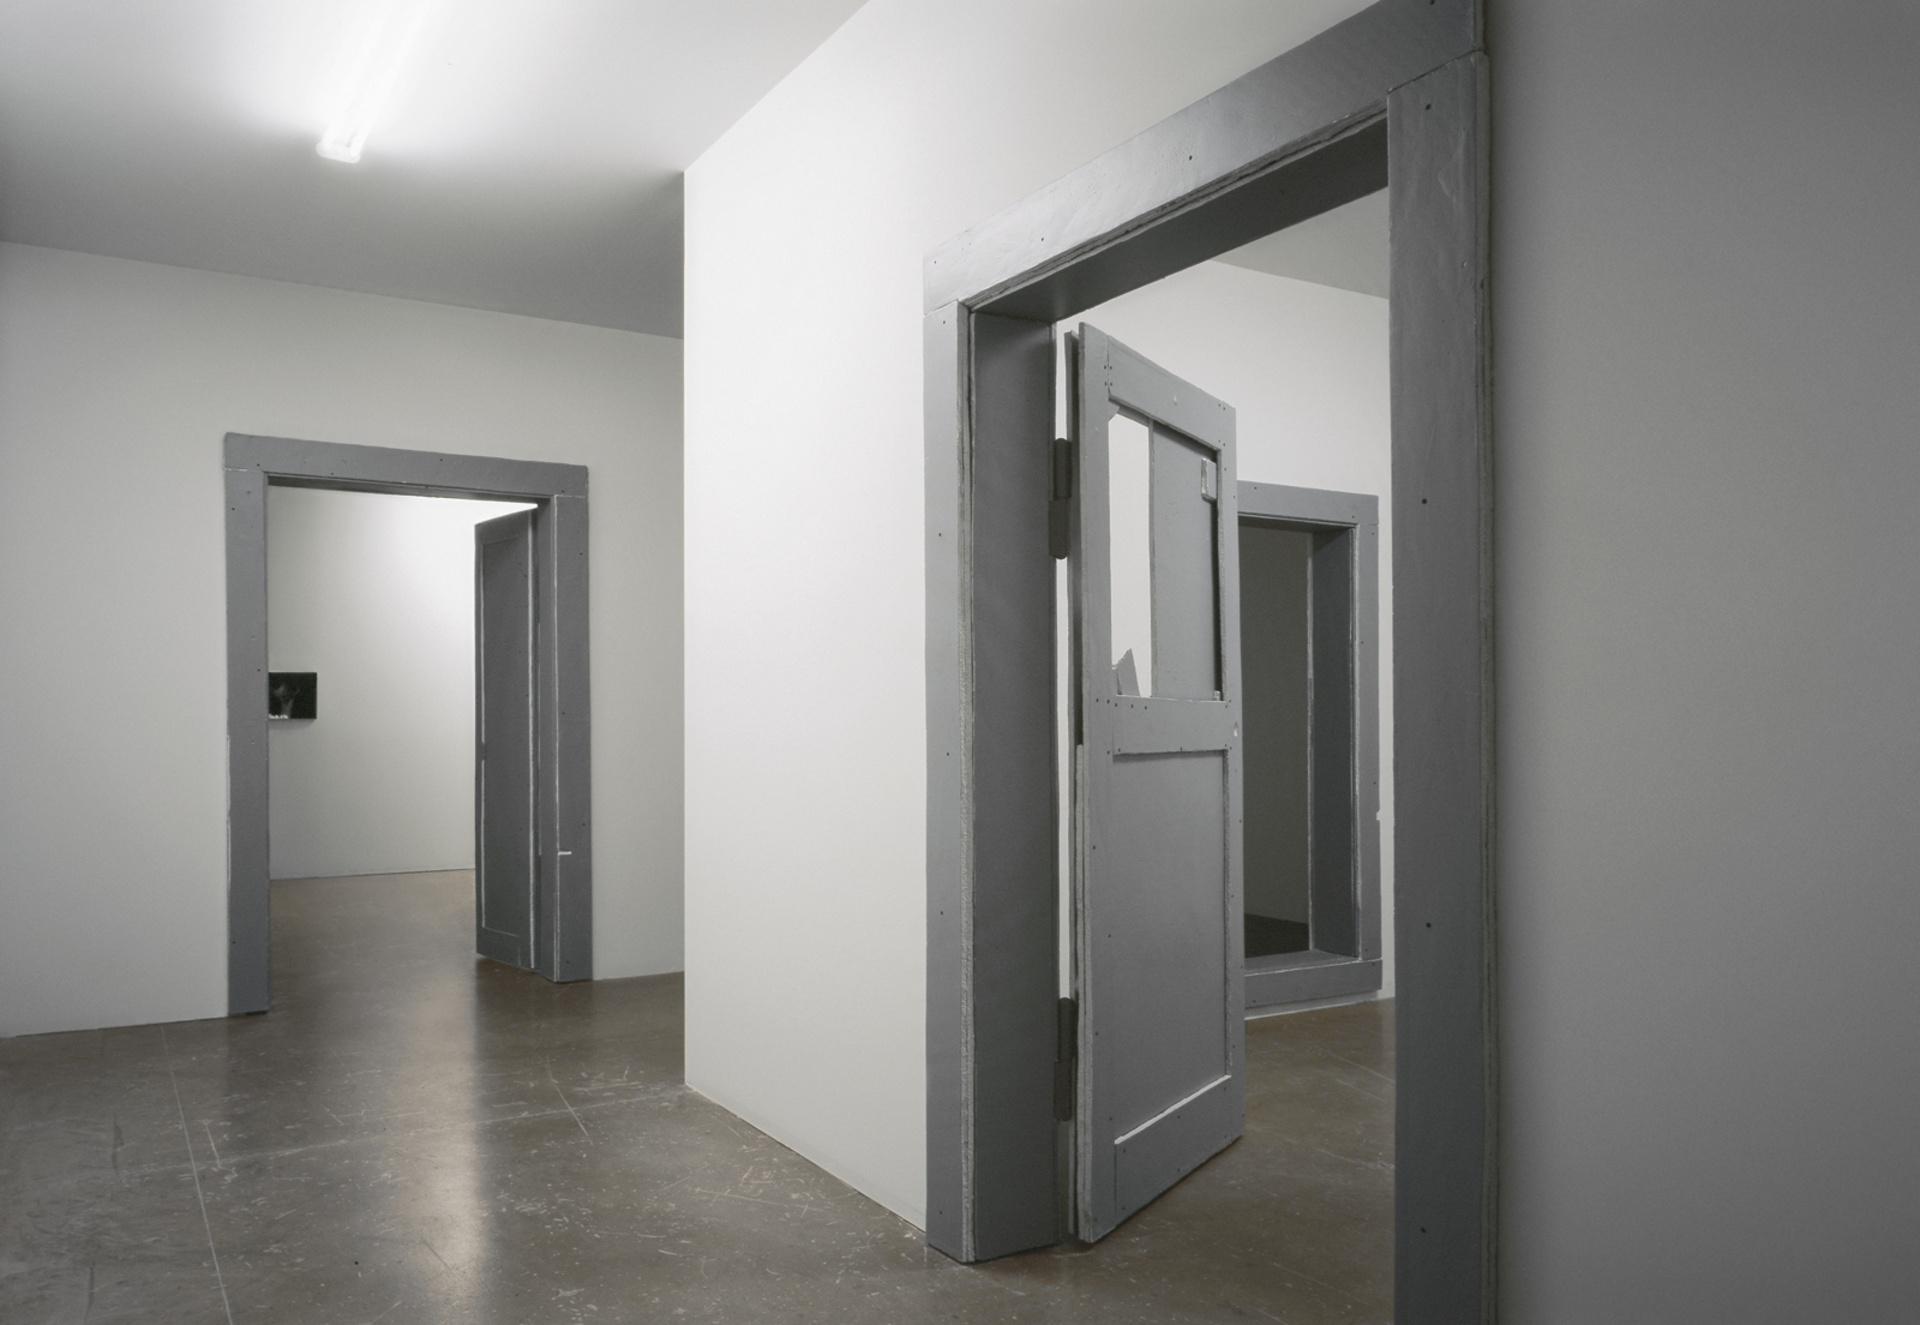 Untitled (Door); Untitled (Door); Untitled (Door)